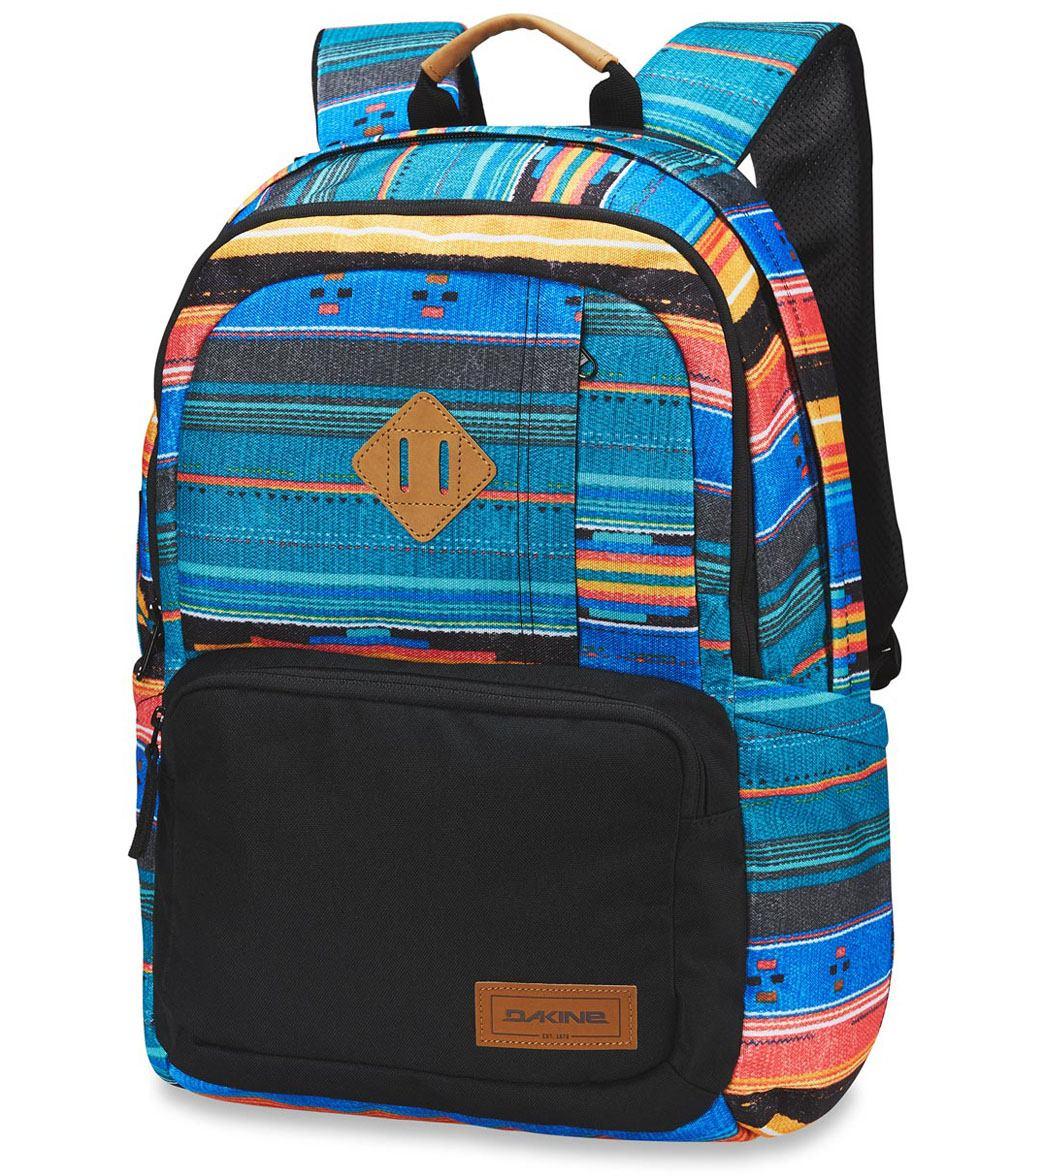 21ededda502 Dakine Women's Alexa 24L Backpack at SwimOutlet.com - Free Shipping